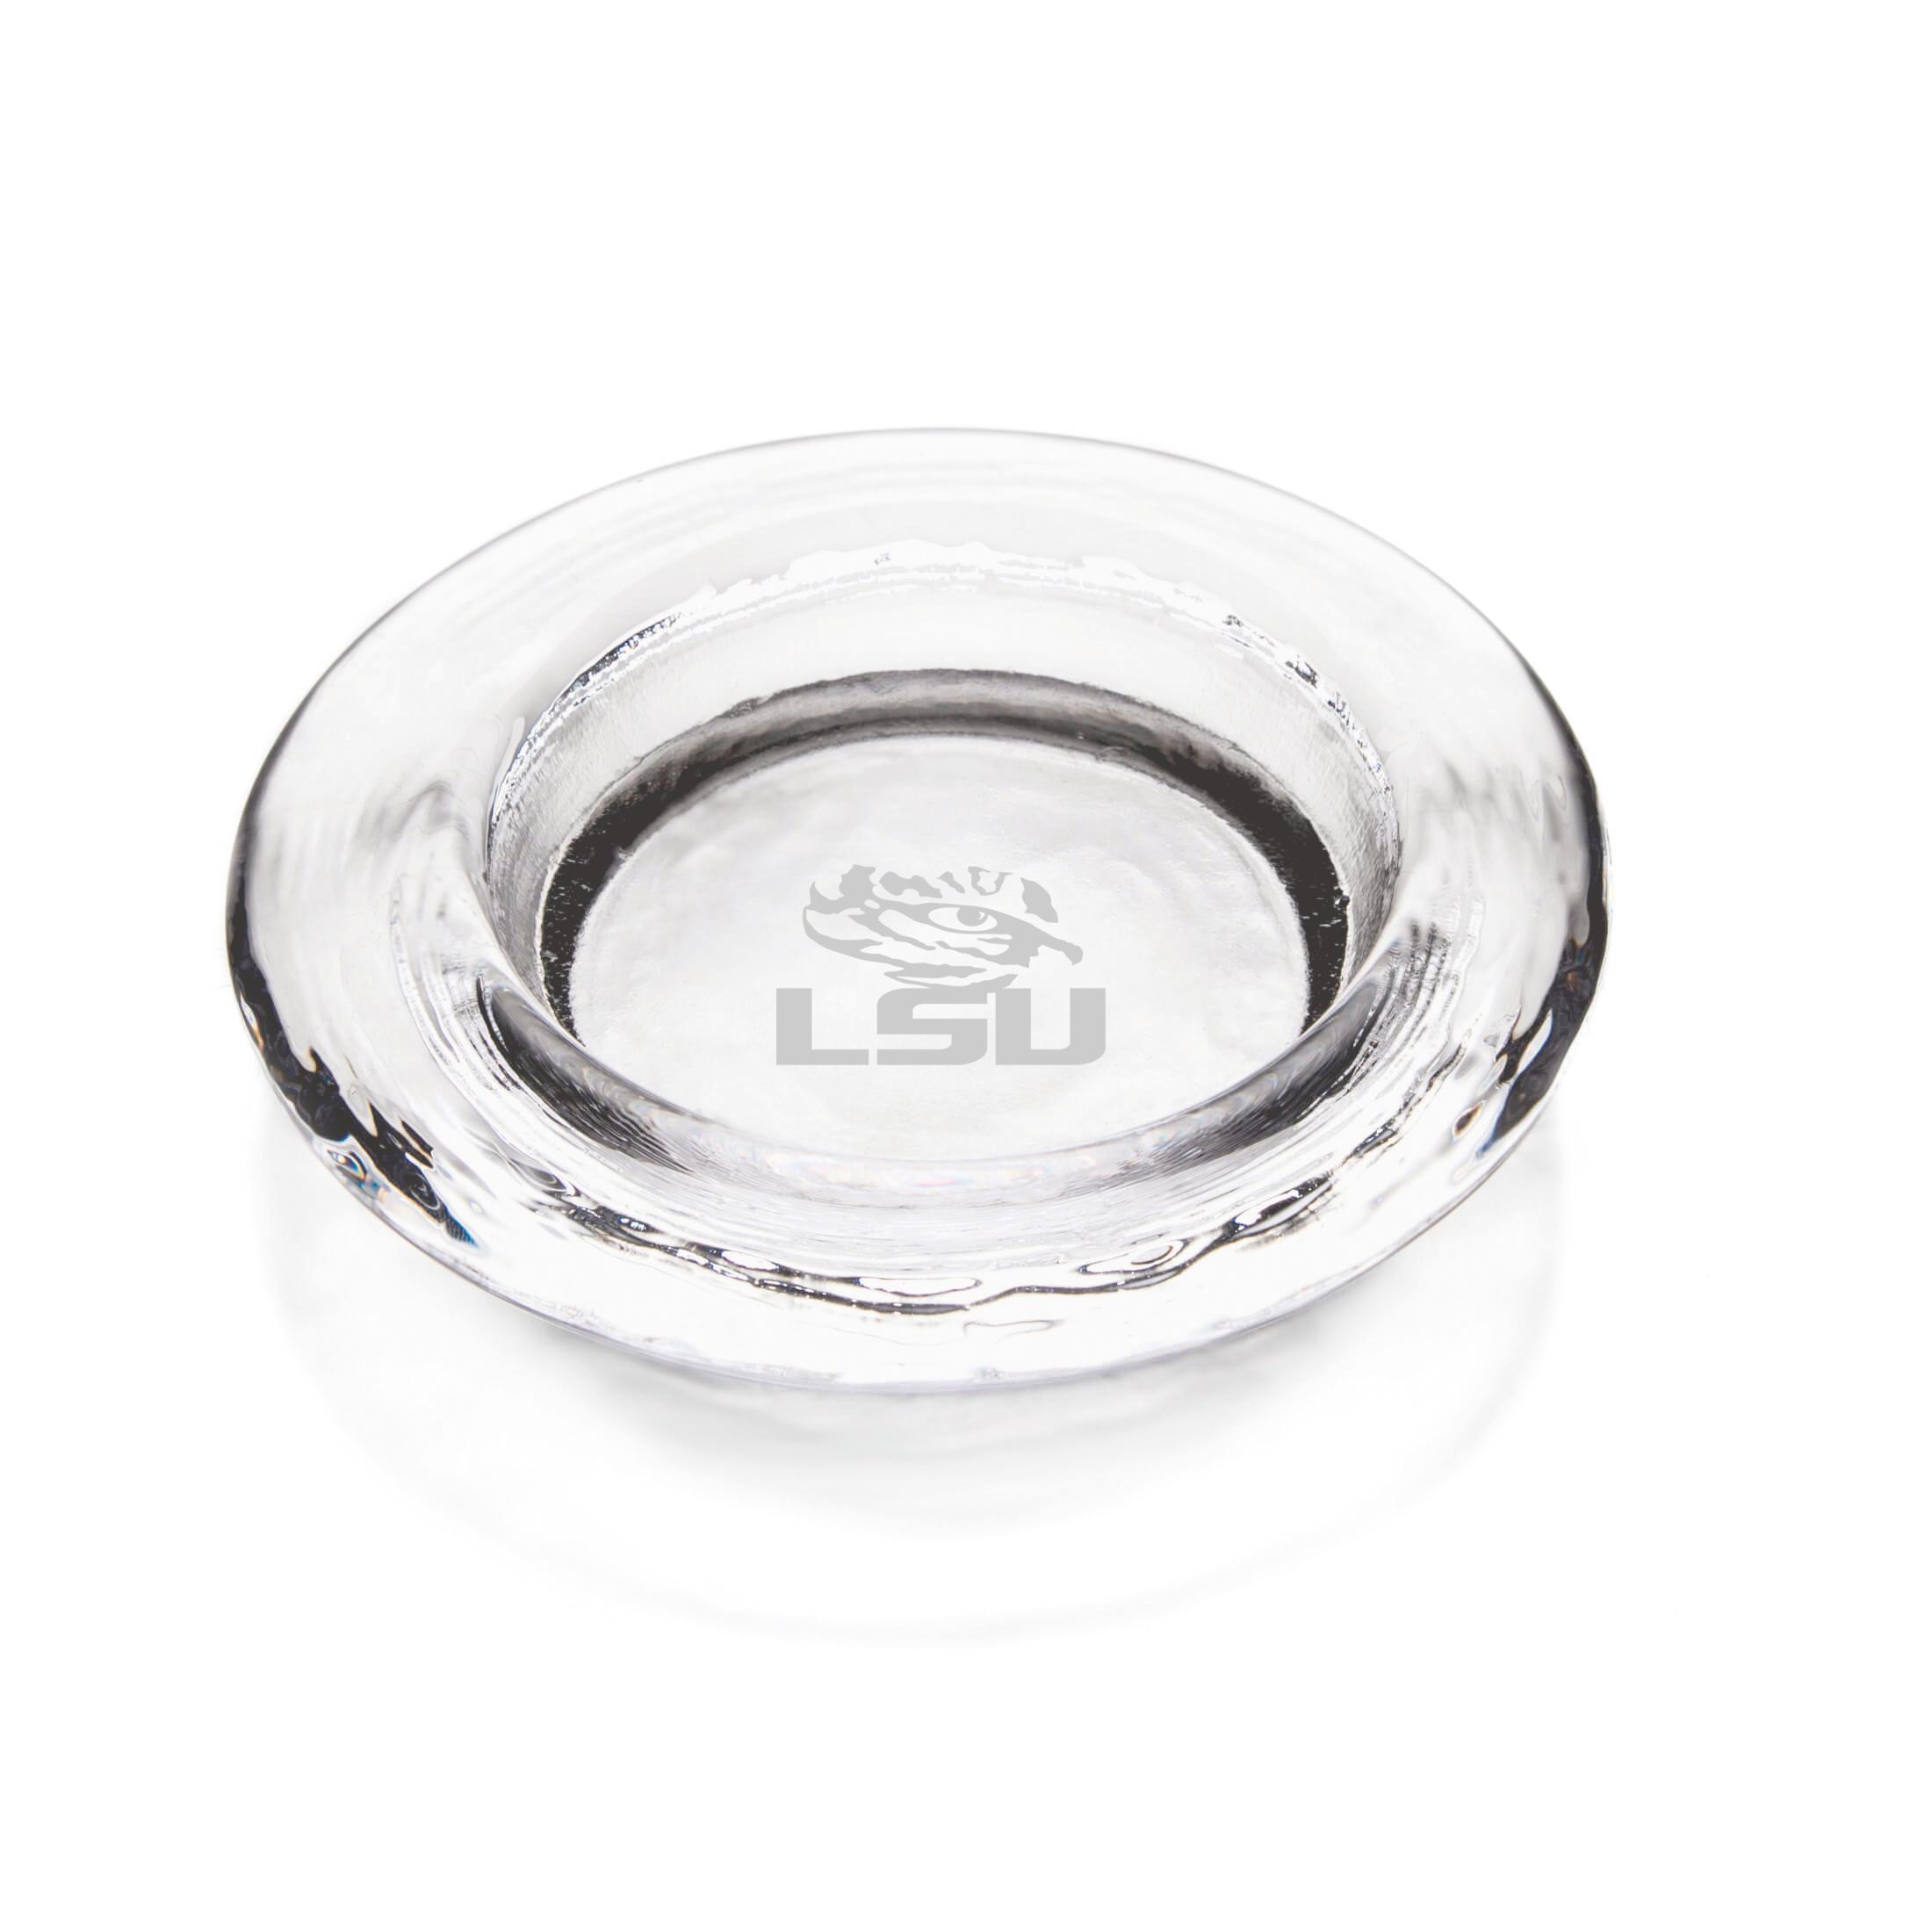 LSU Glass Wine Coaster by Simon Pearce